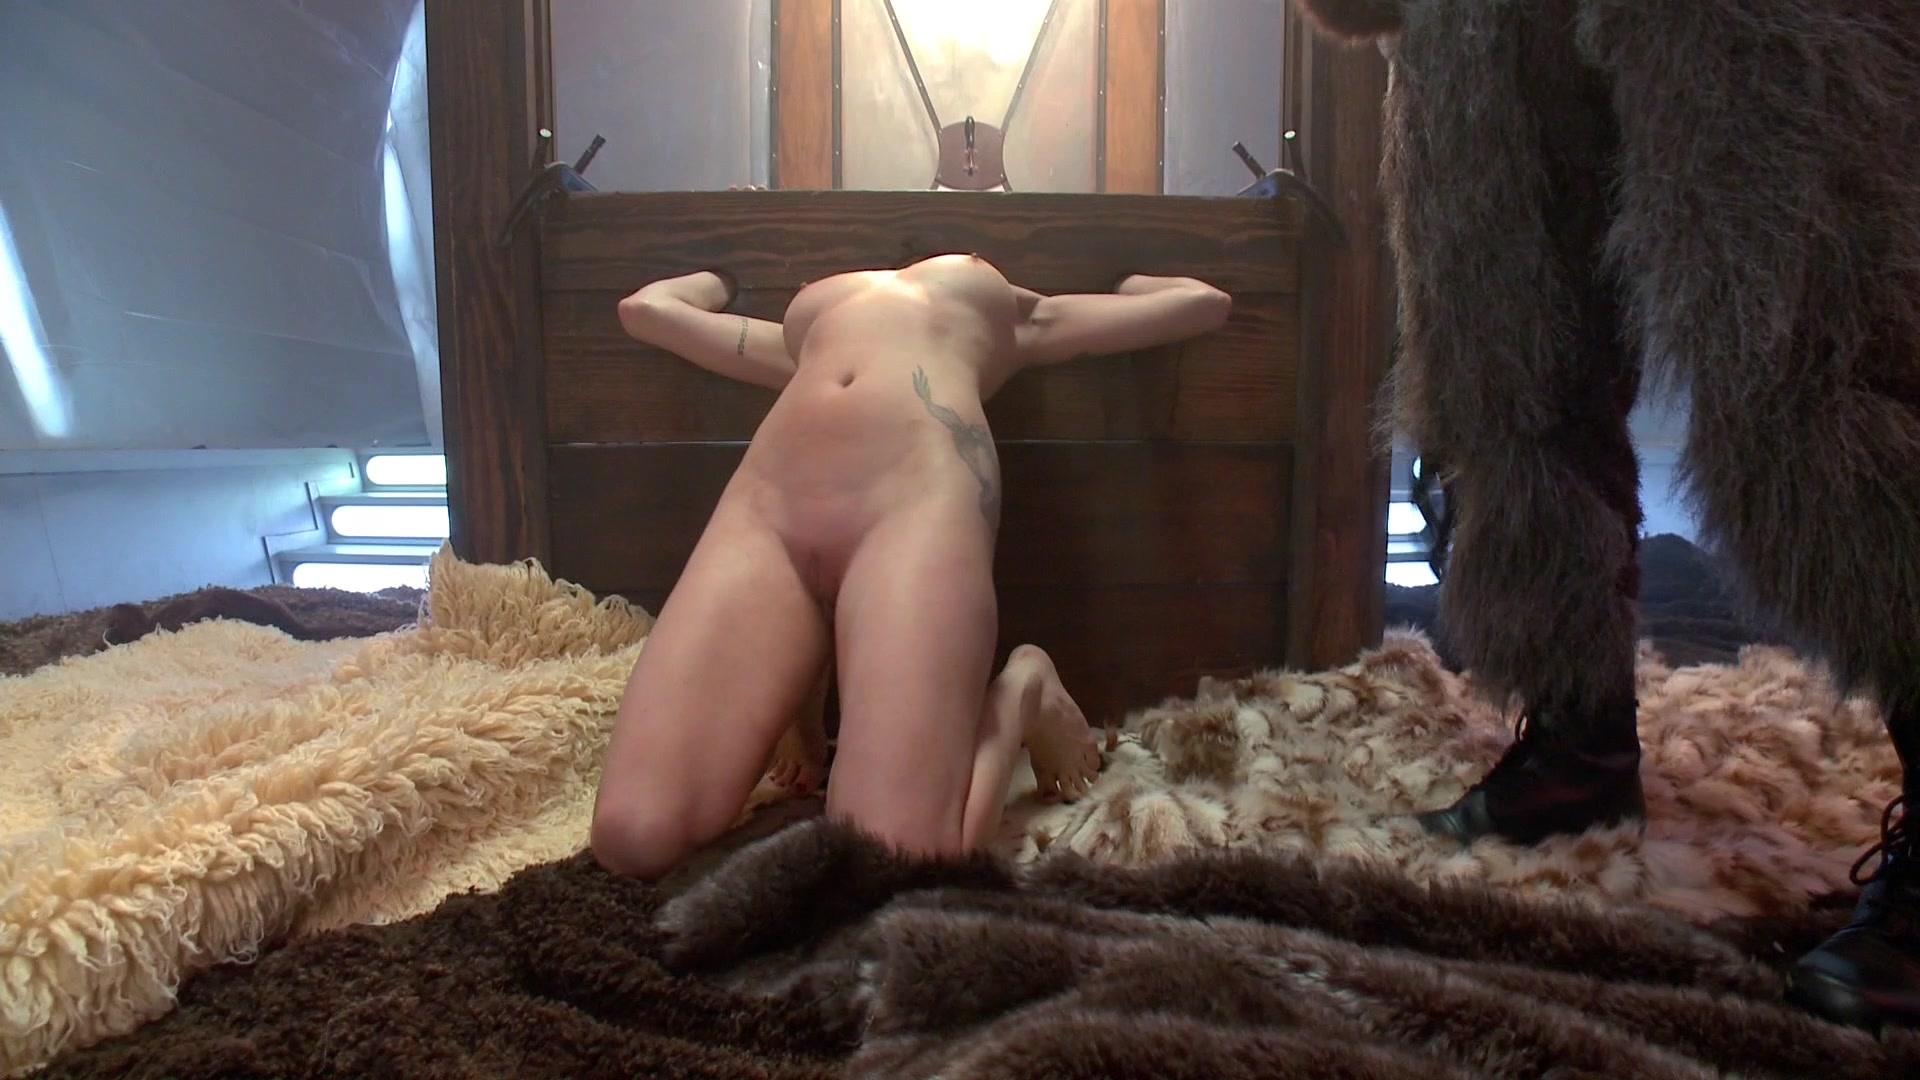 Nude photos Vintage naked women pics